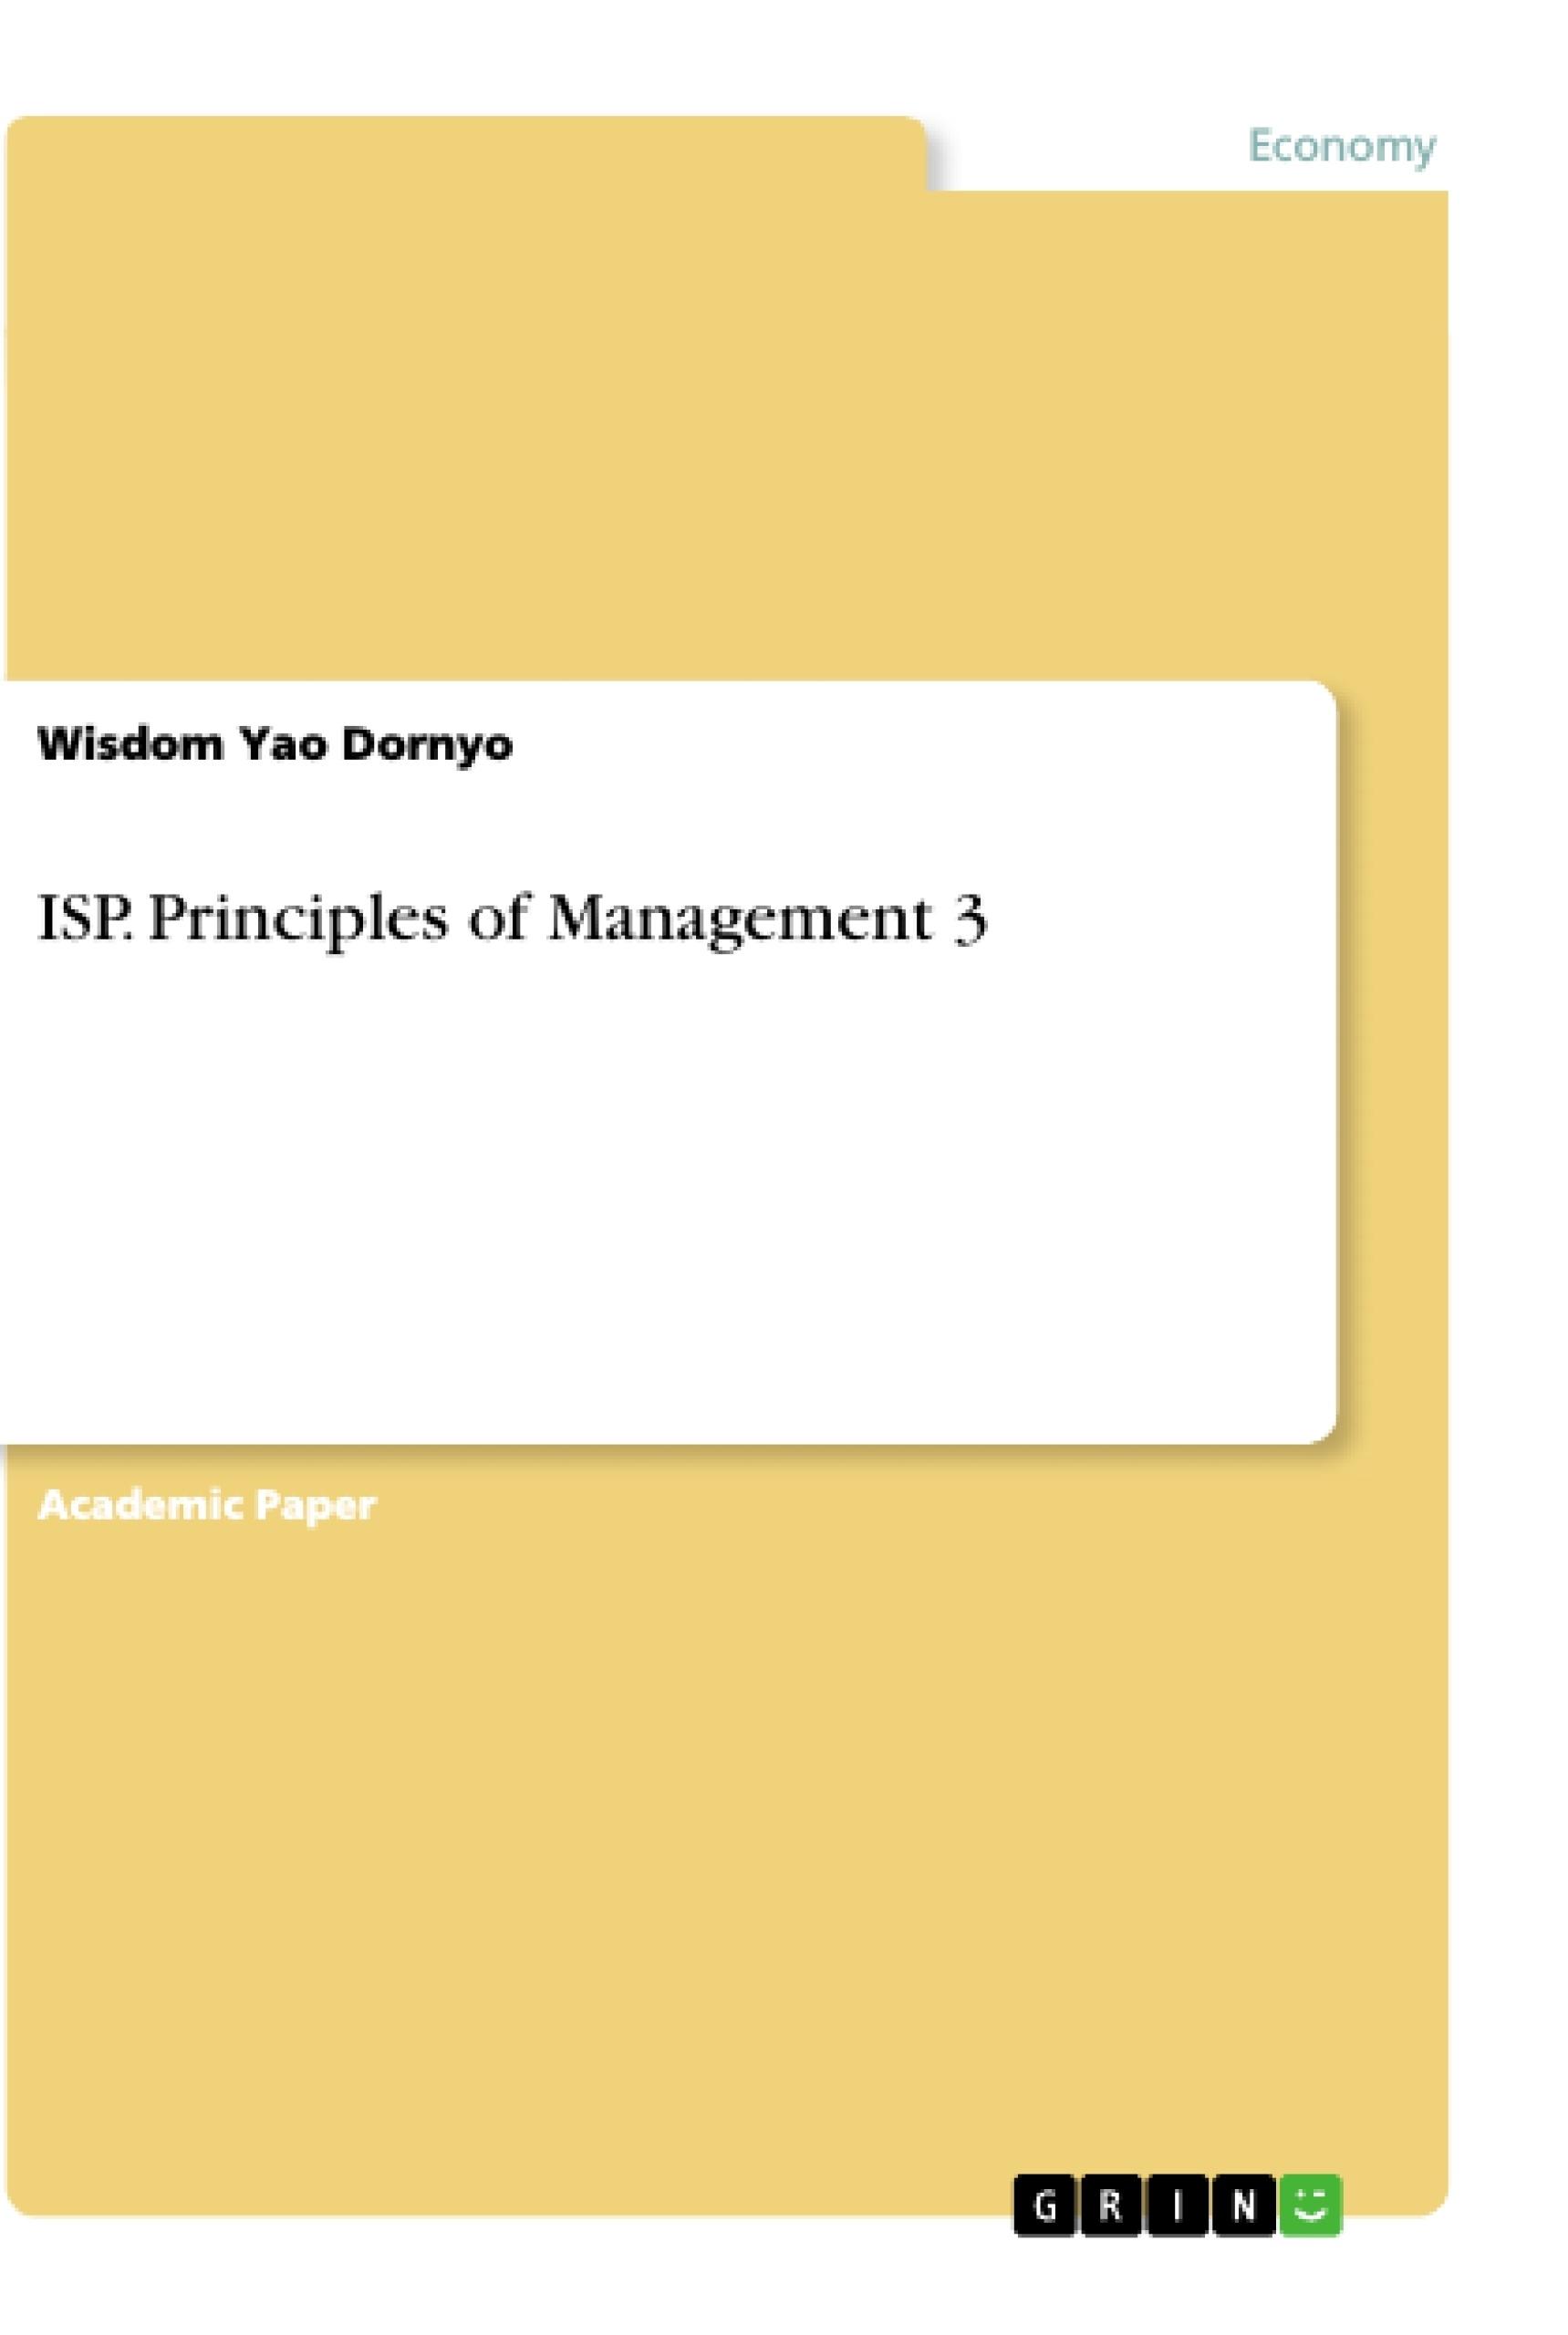 Title: ISP. Principles of Management 3